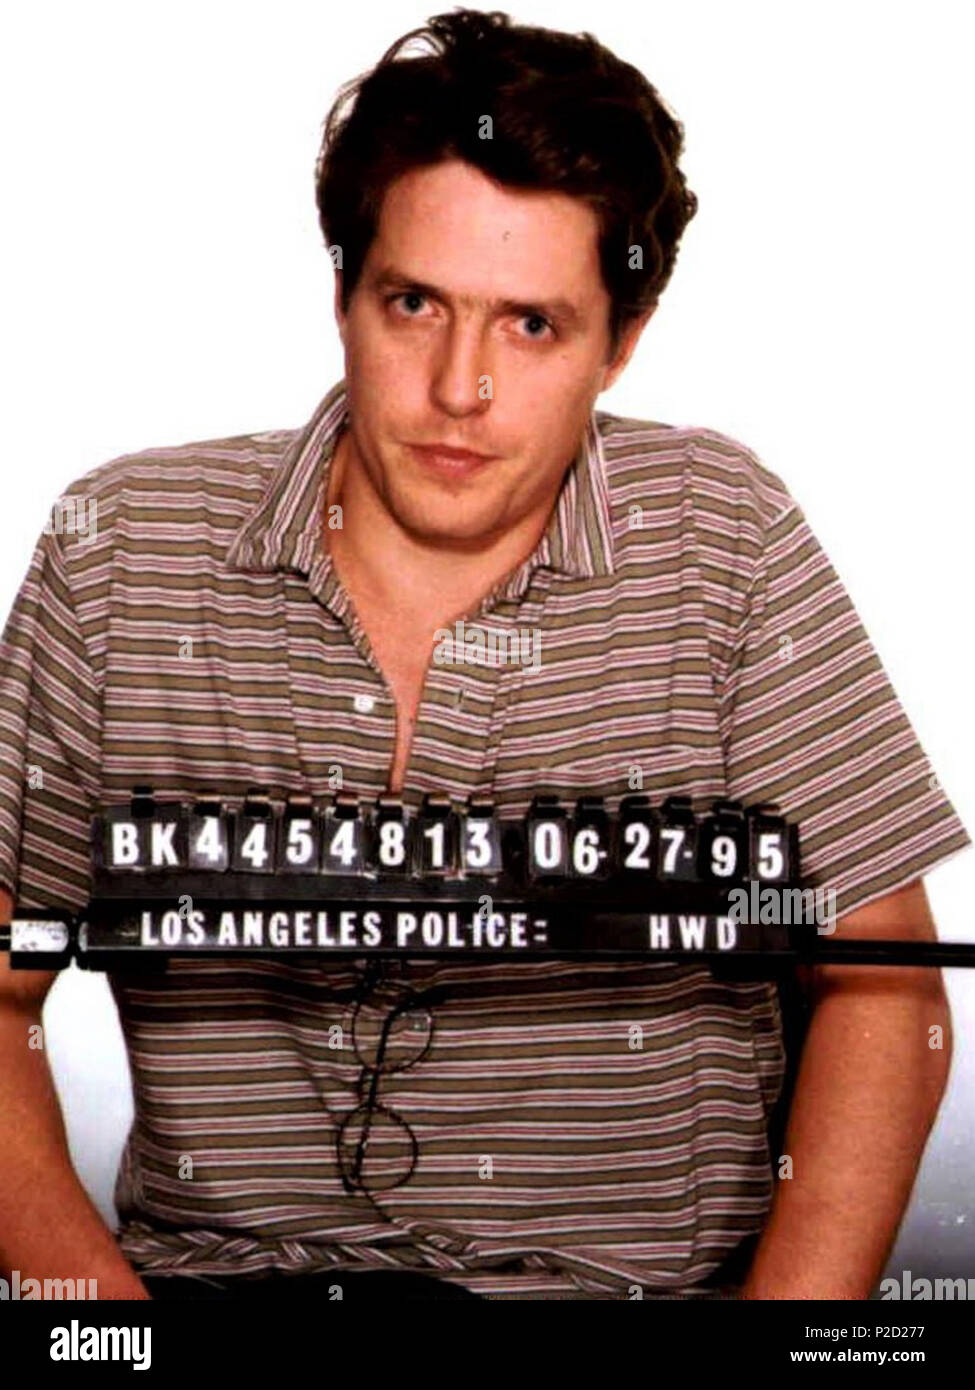 Hugh Grant mugshot, 1995   27 June 1995  Los Angeles County